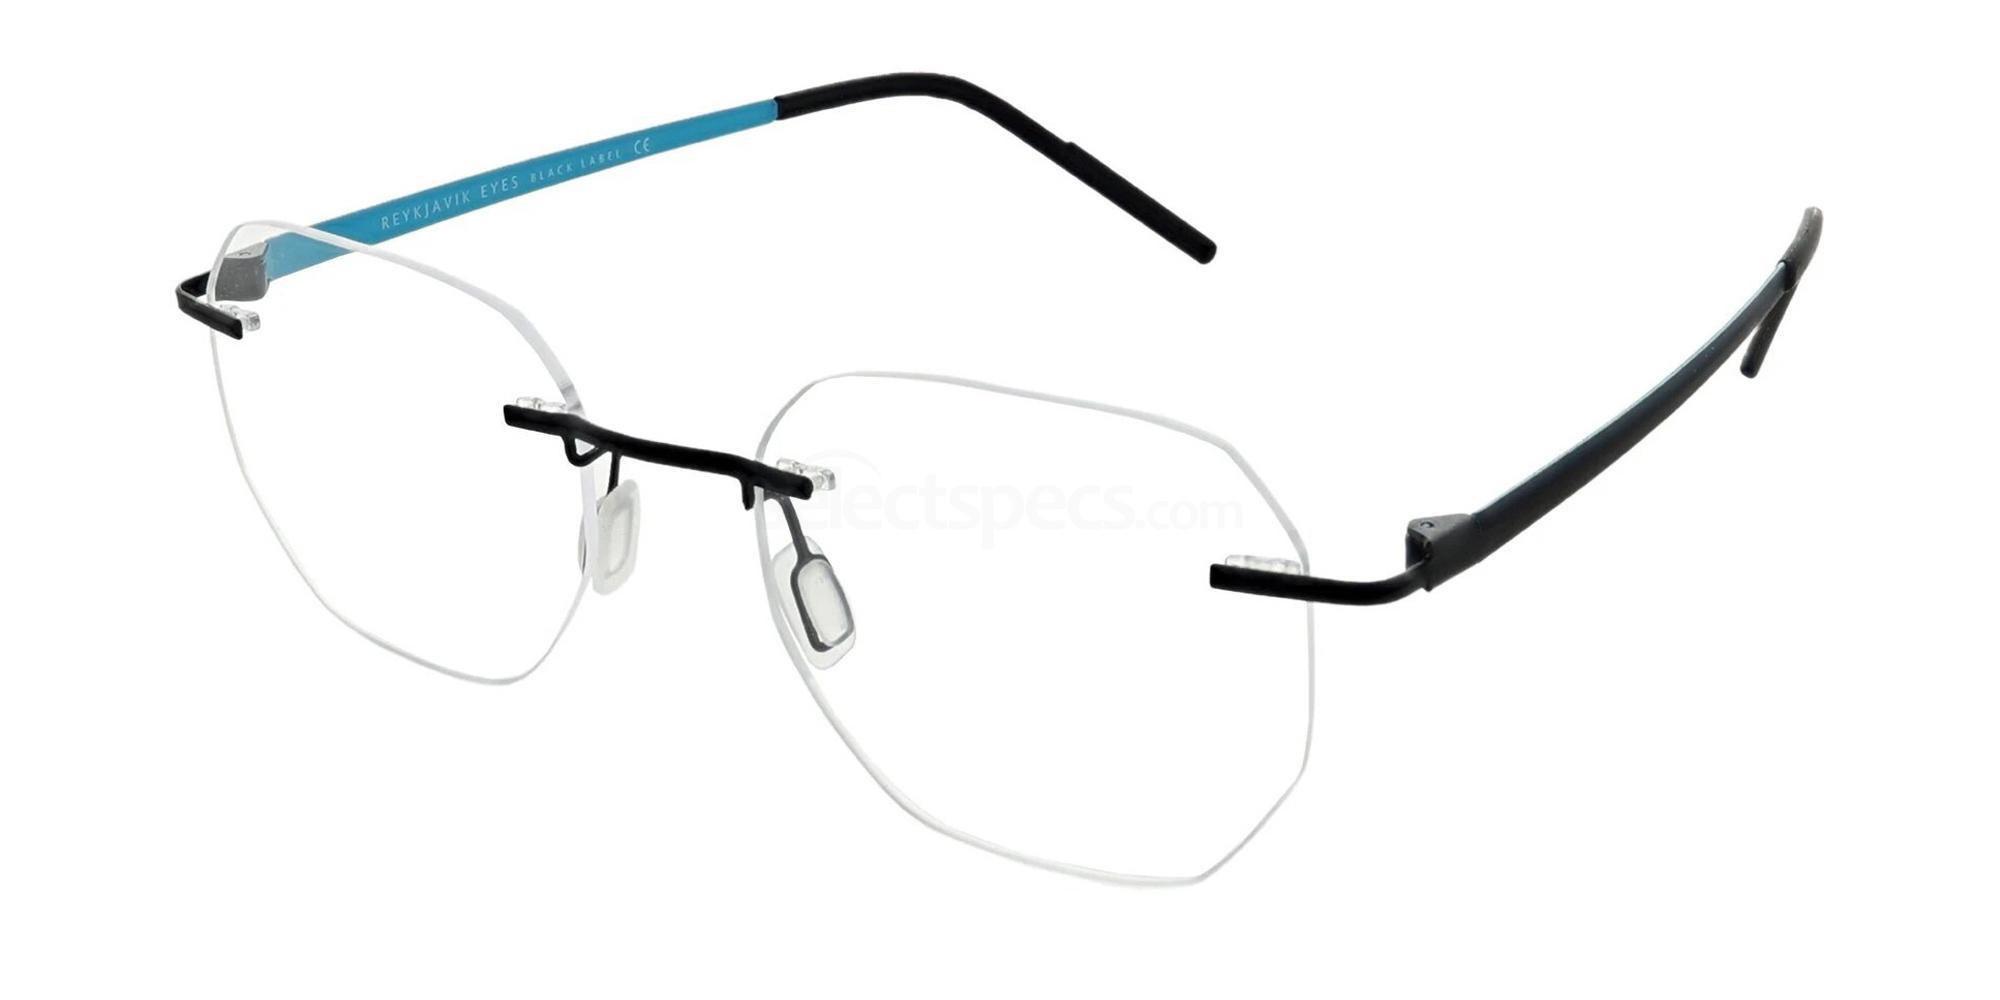 C1 HENRIK Glasses, Reykjavik Eyes Black Label